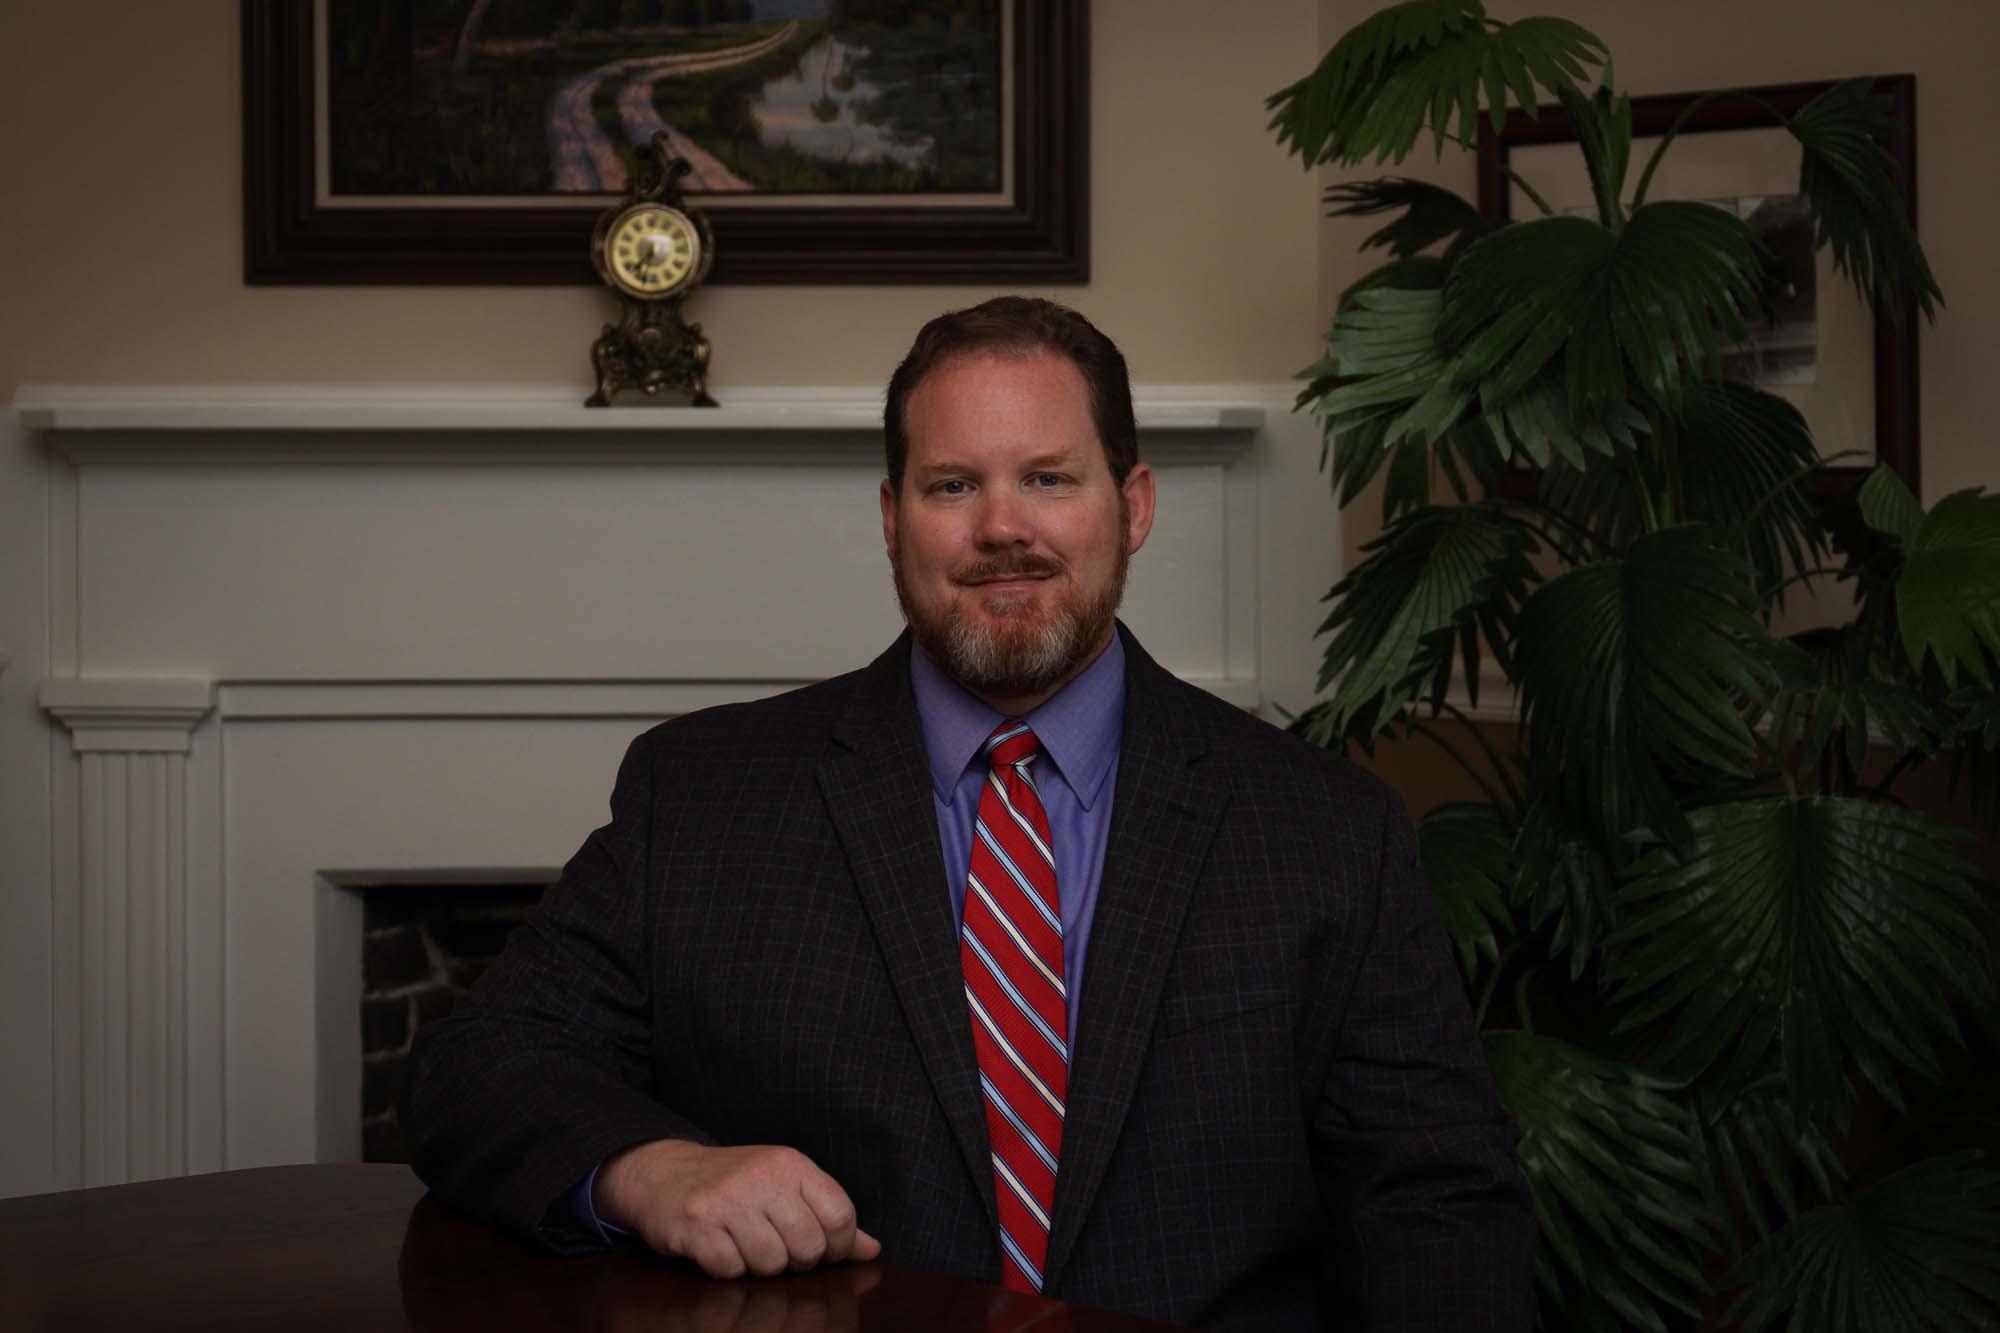 Top Lawyer in the Treasure Coast - South Florida's Frank H. Fee IV, Esq.